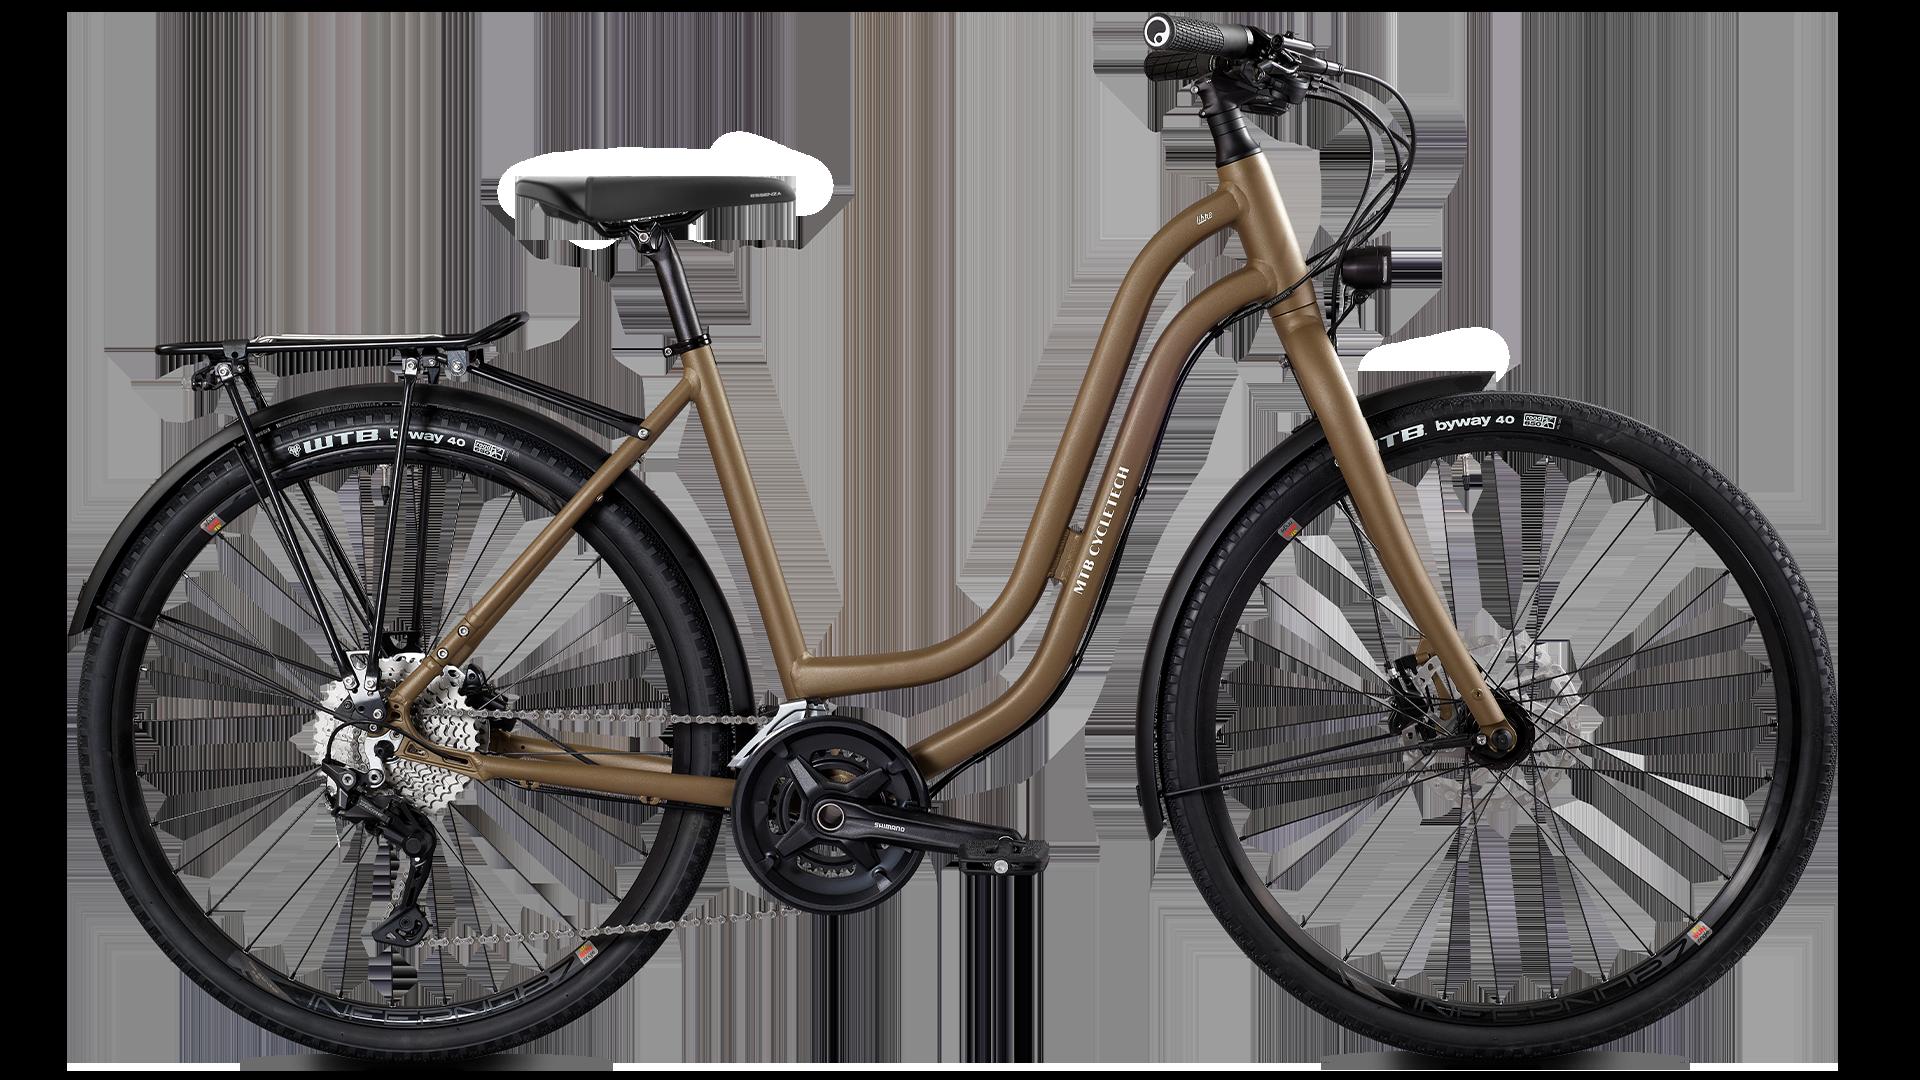 Modell - Libre - MTB Cycletech